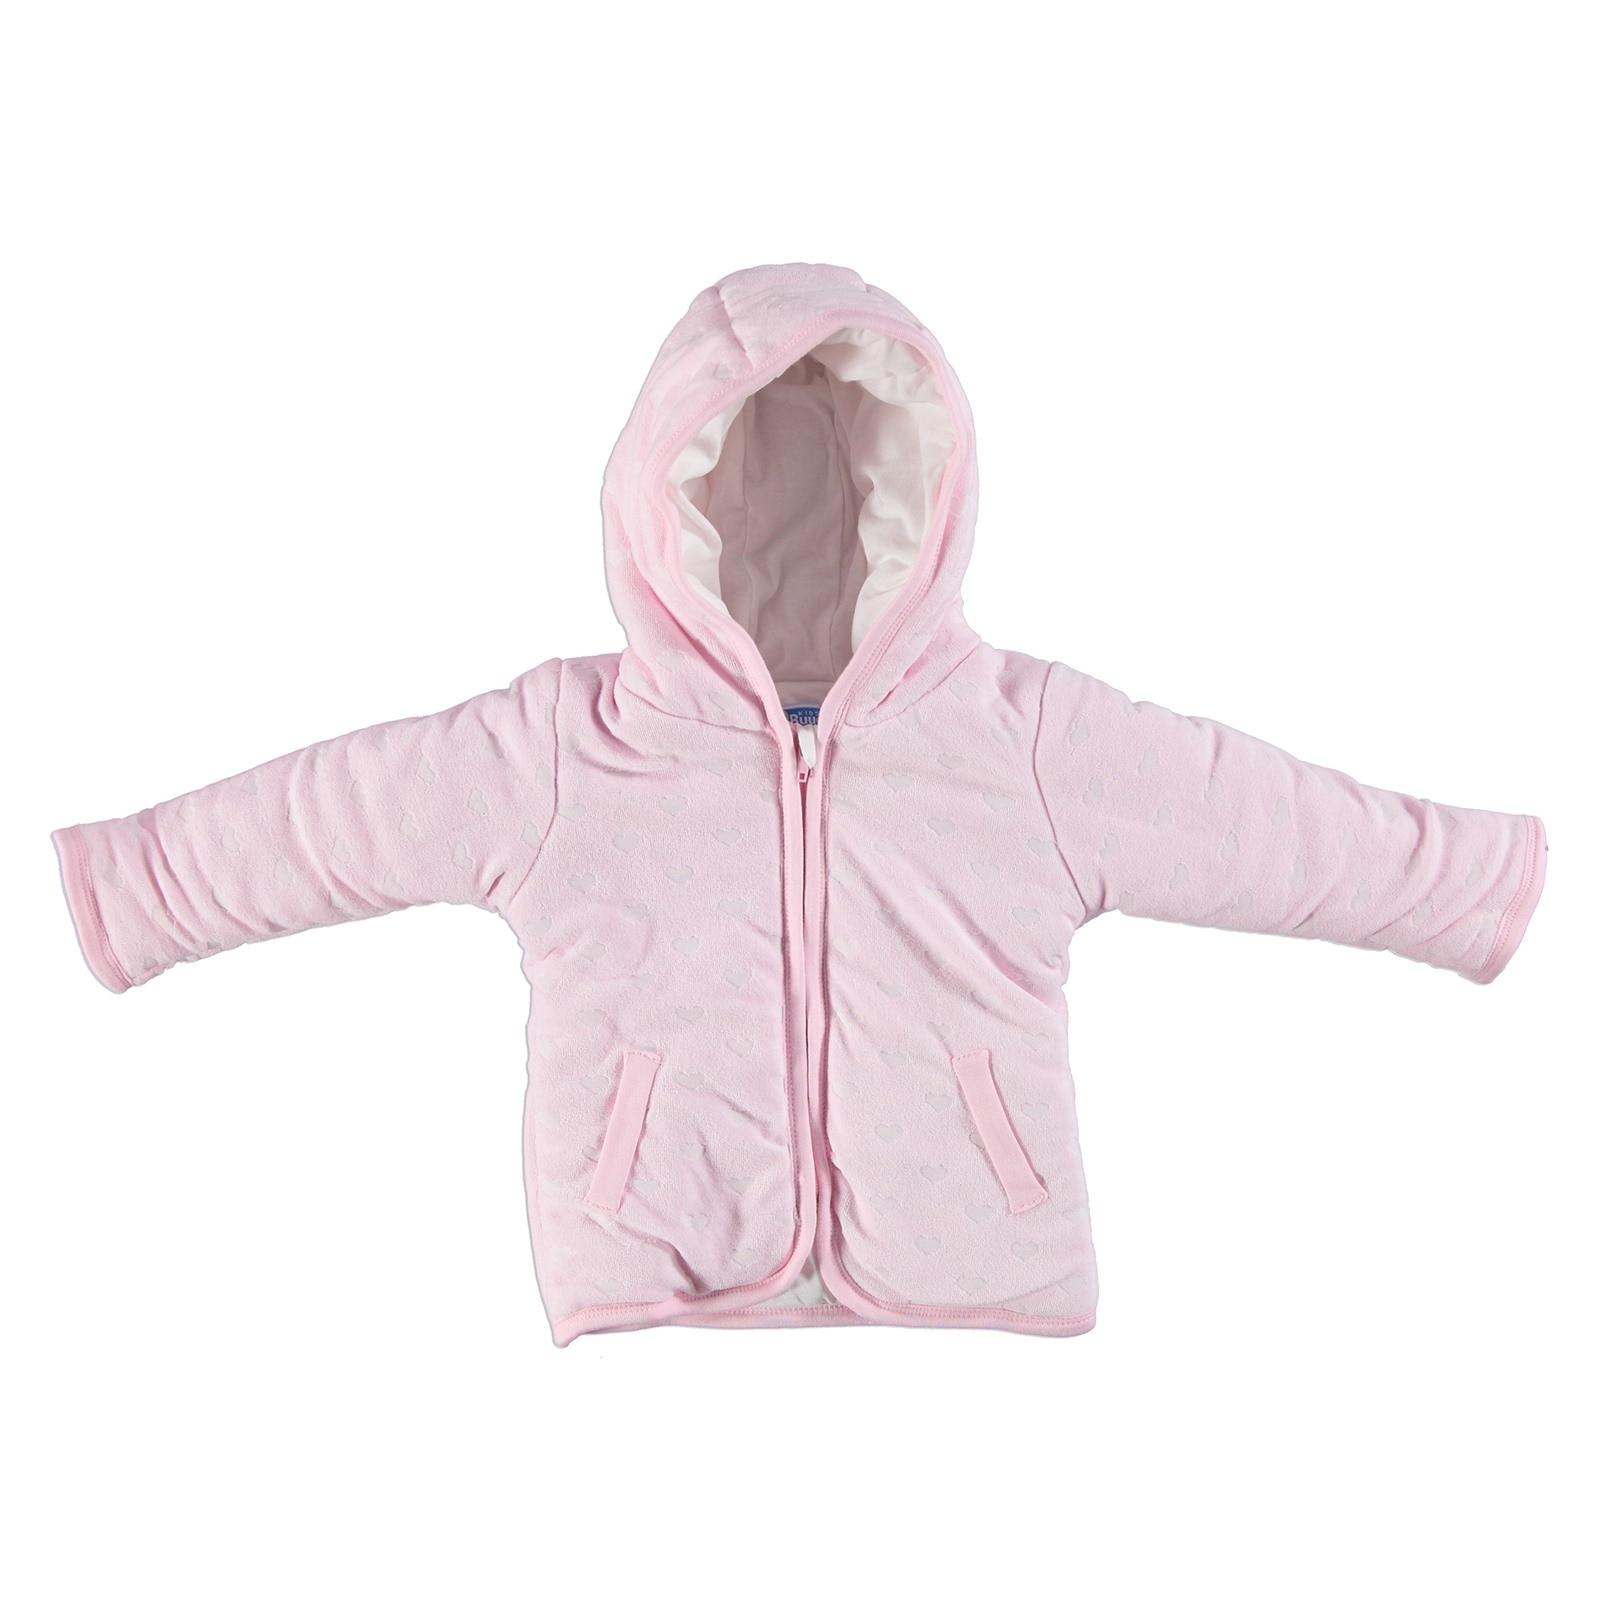 Ebebek Buude Kids Velvet Baby Sweater Cardigan